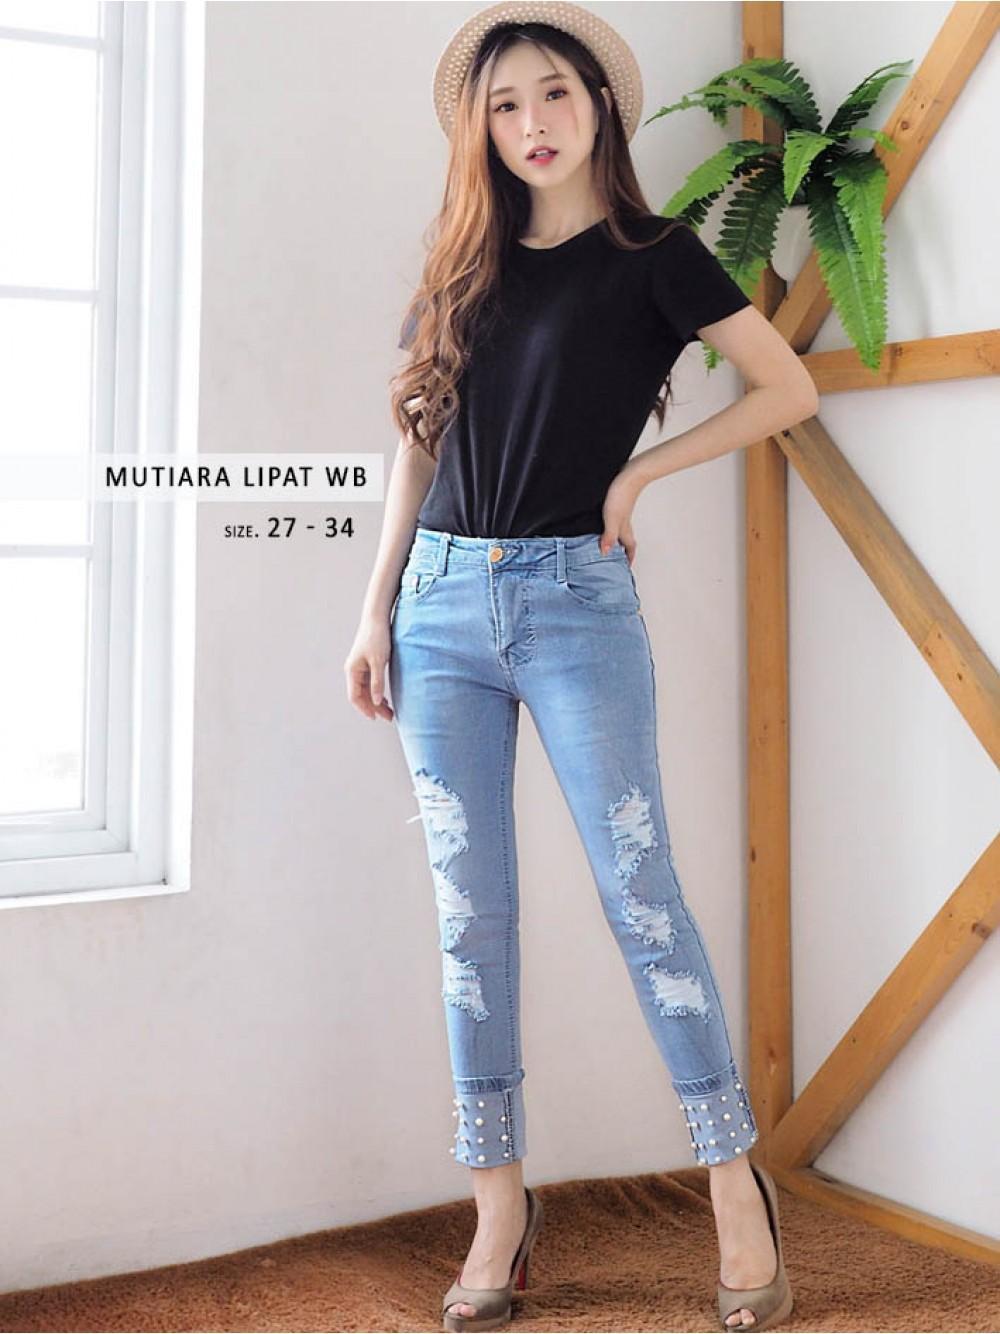 Fitur Celana Jeans Big Size Ripped Wanita Jumbo Mutiara Light Lipat Wb Uk 27 34